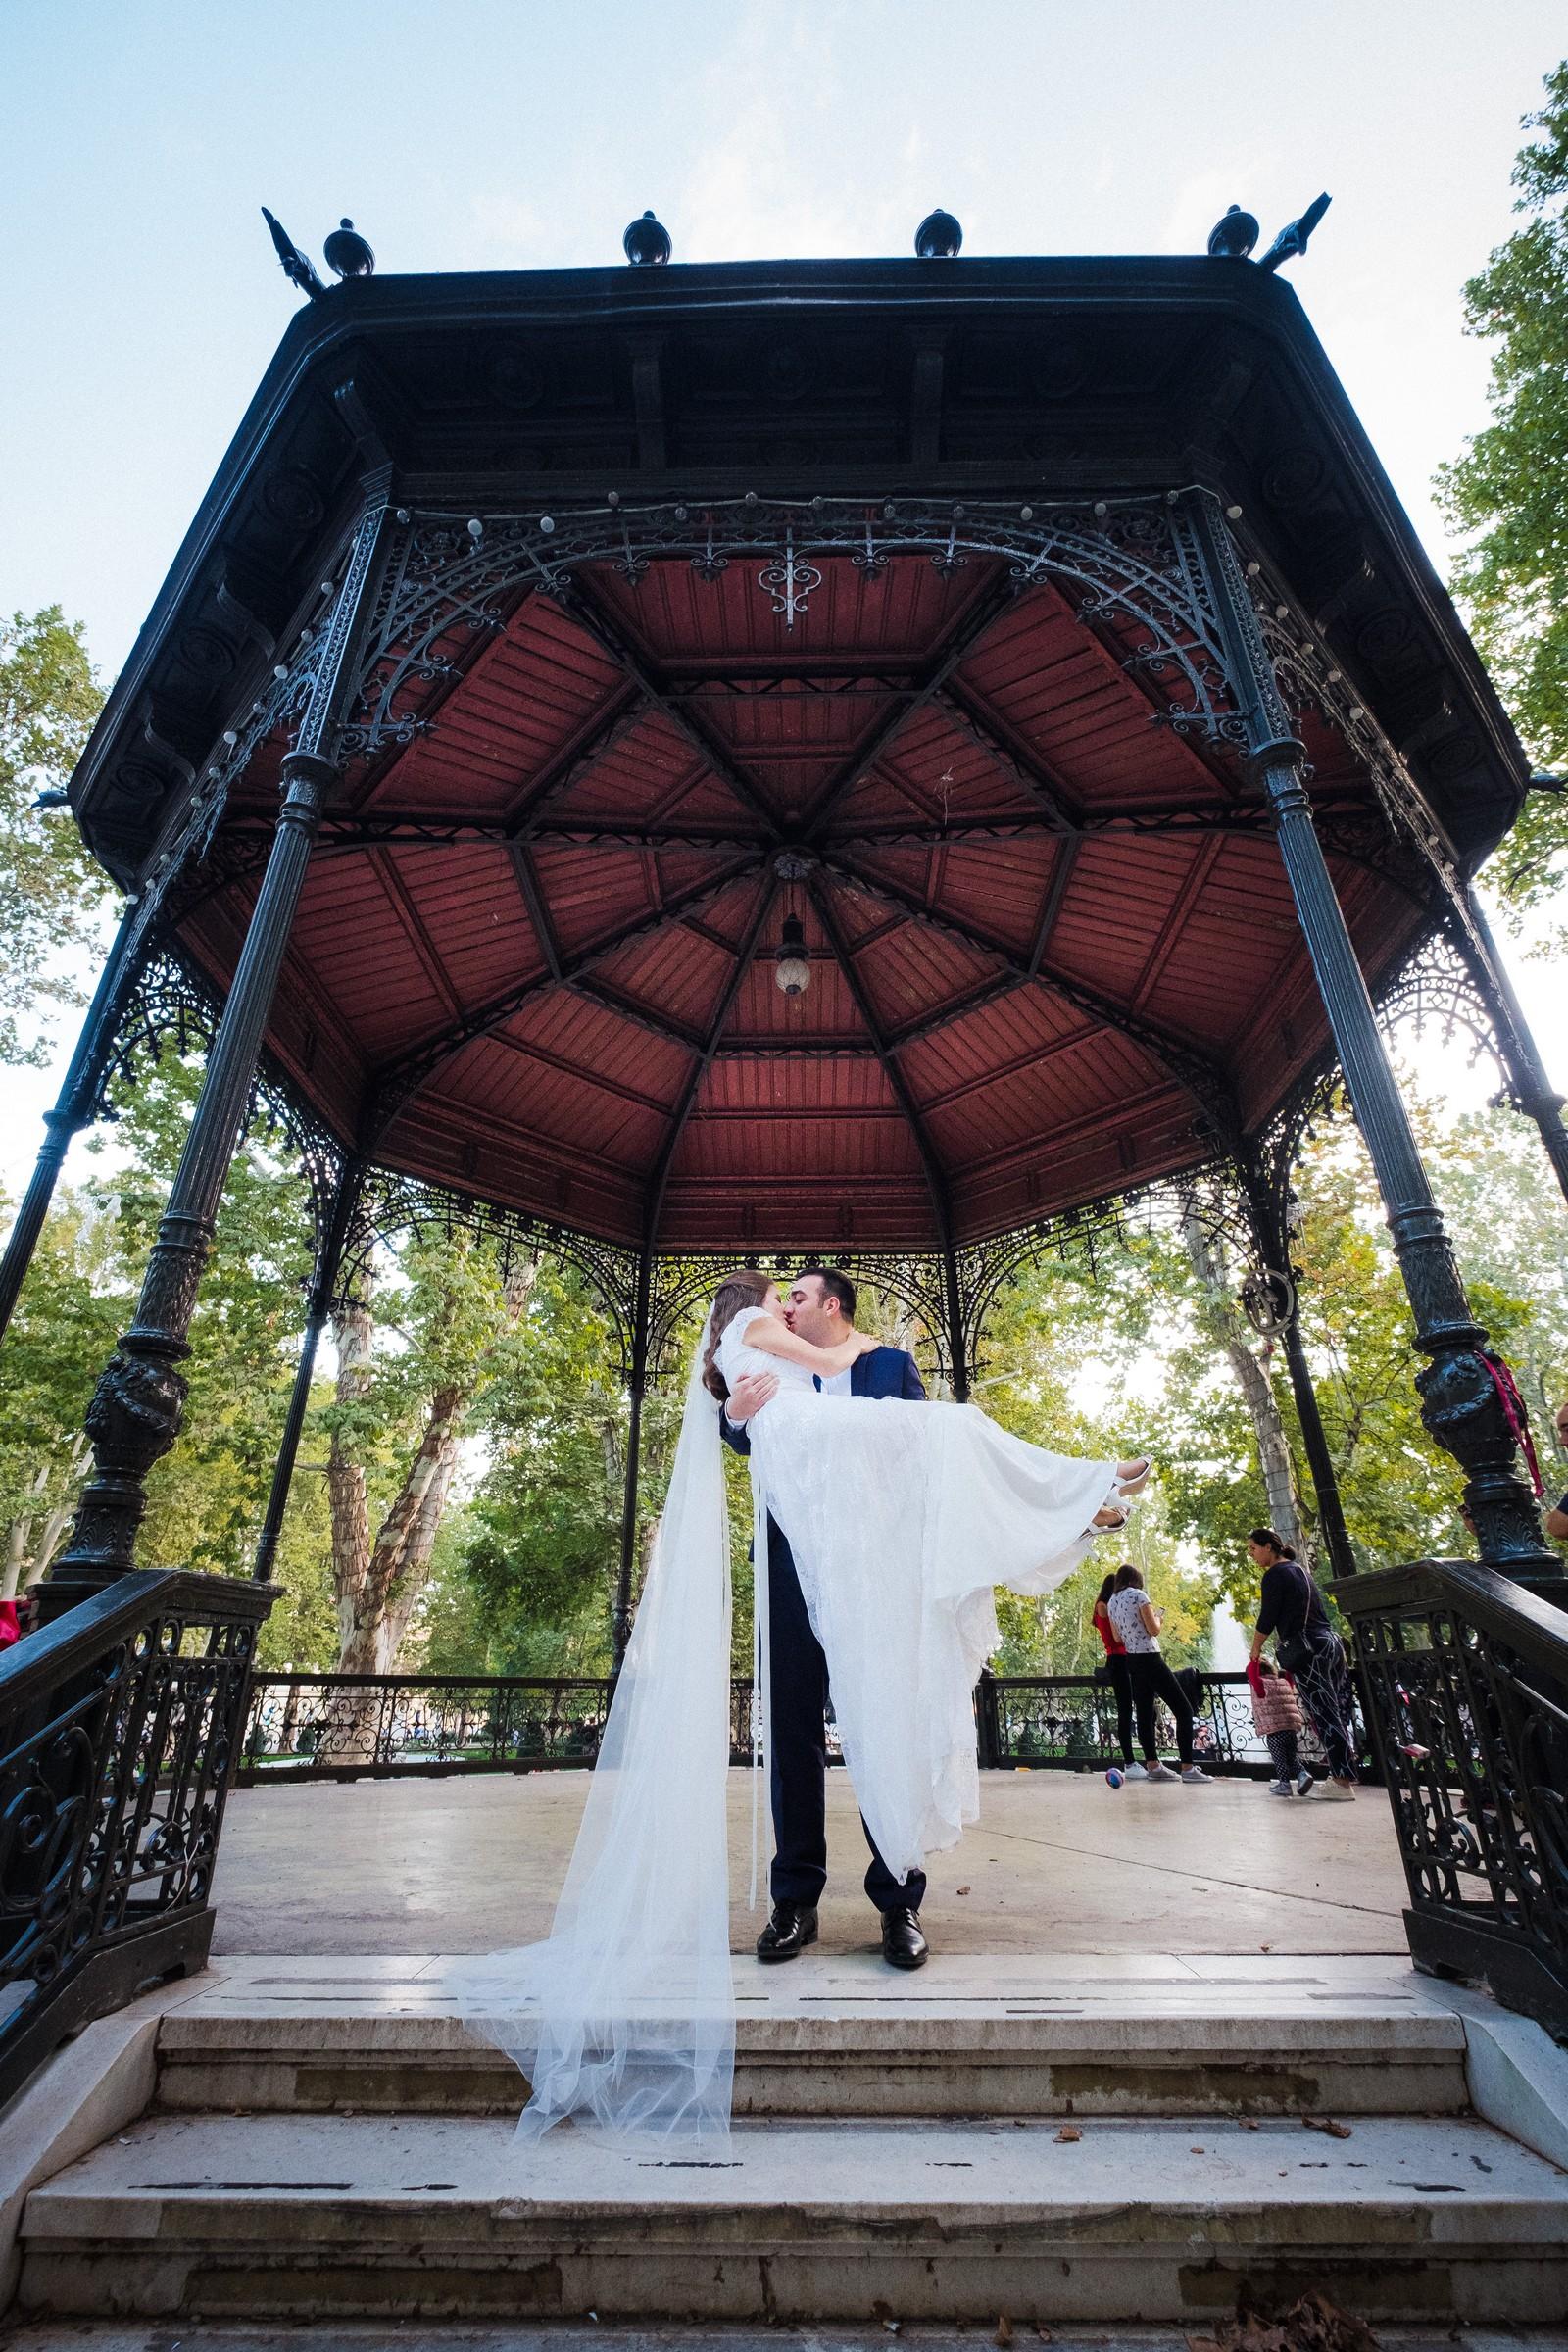 groom holding bride in his hands in Zrinjevac pavillion